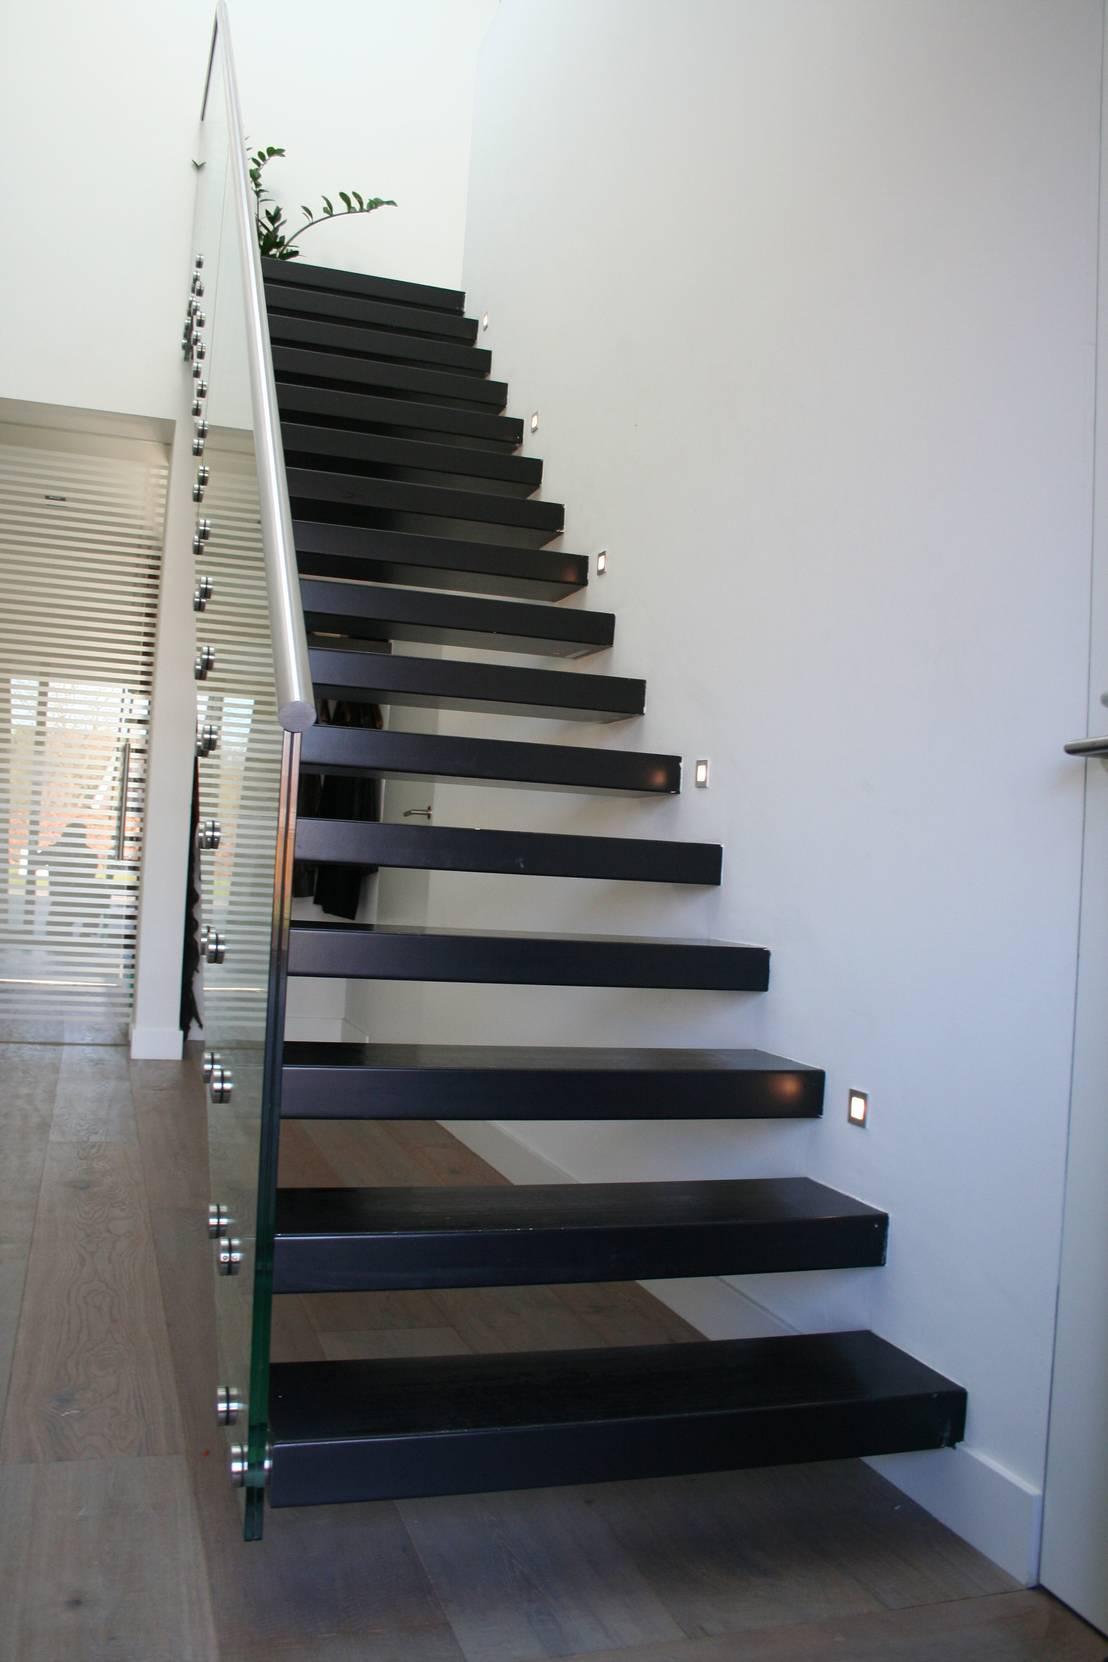 Zwevende trap met glazen balustrade door allstairs for Balustrade trap